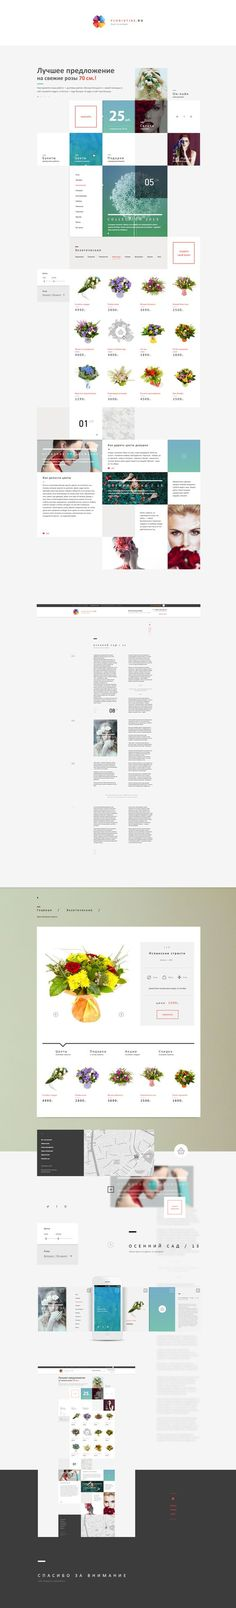 Website layout inspiration #flowers #florist #web #design #webdesign